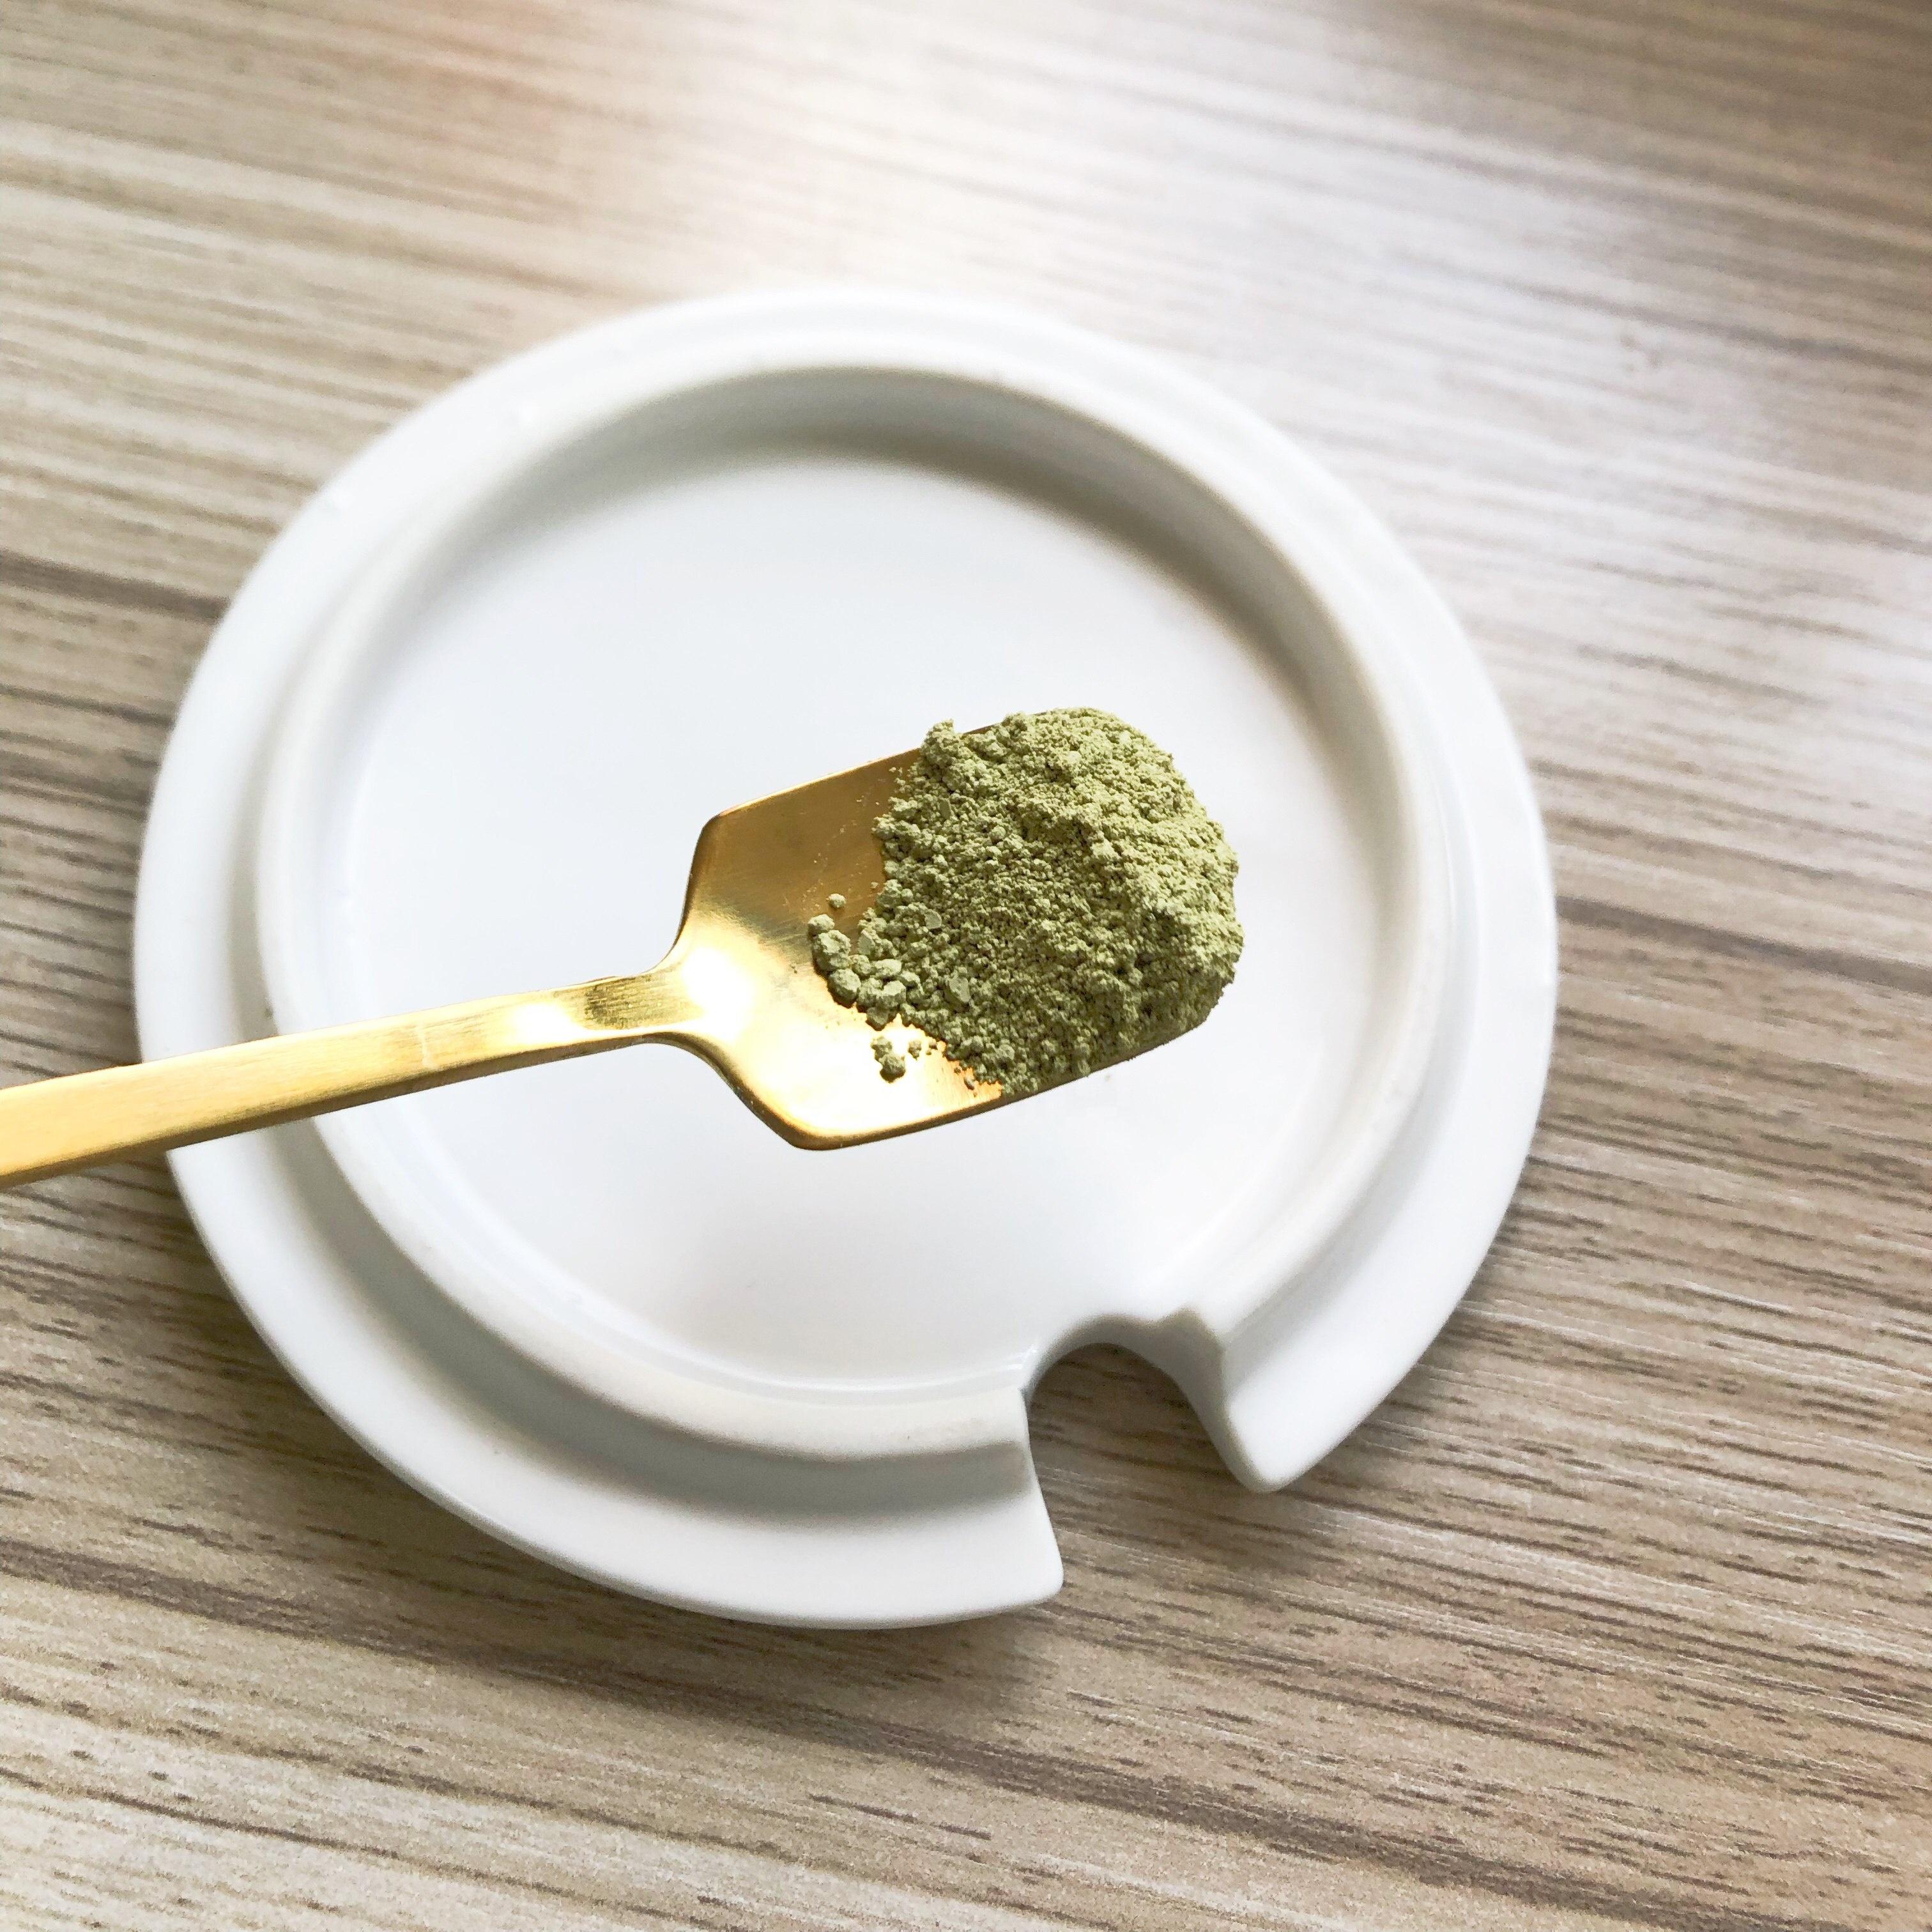 Top quality organic matcha green tea powder - 4uTea   4uTea.com